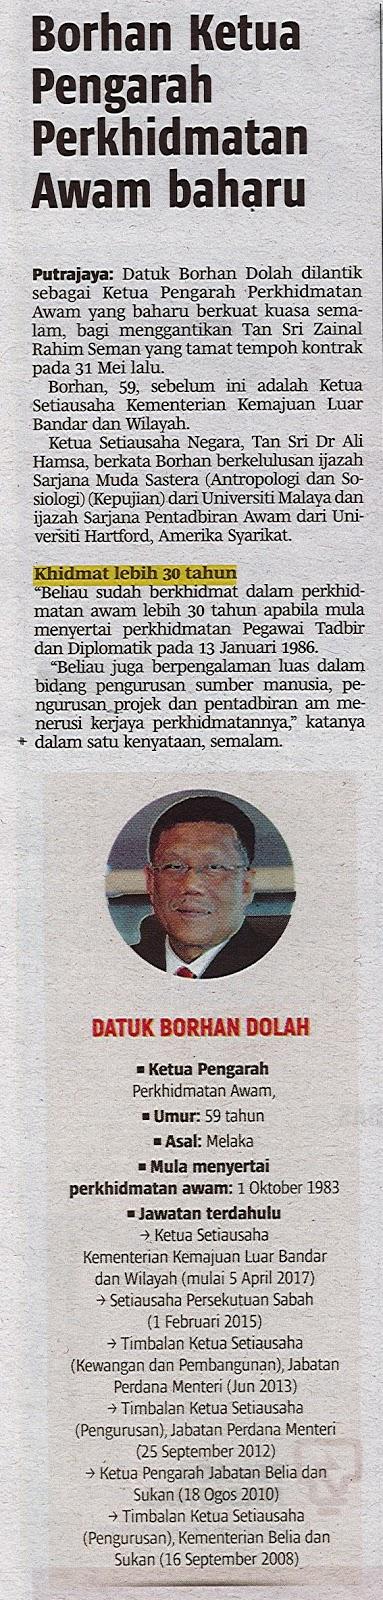 http://perpustakaanjbpm.blogspot.com